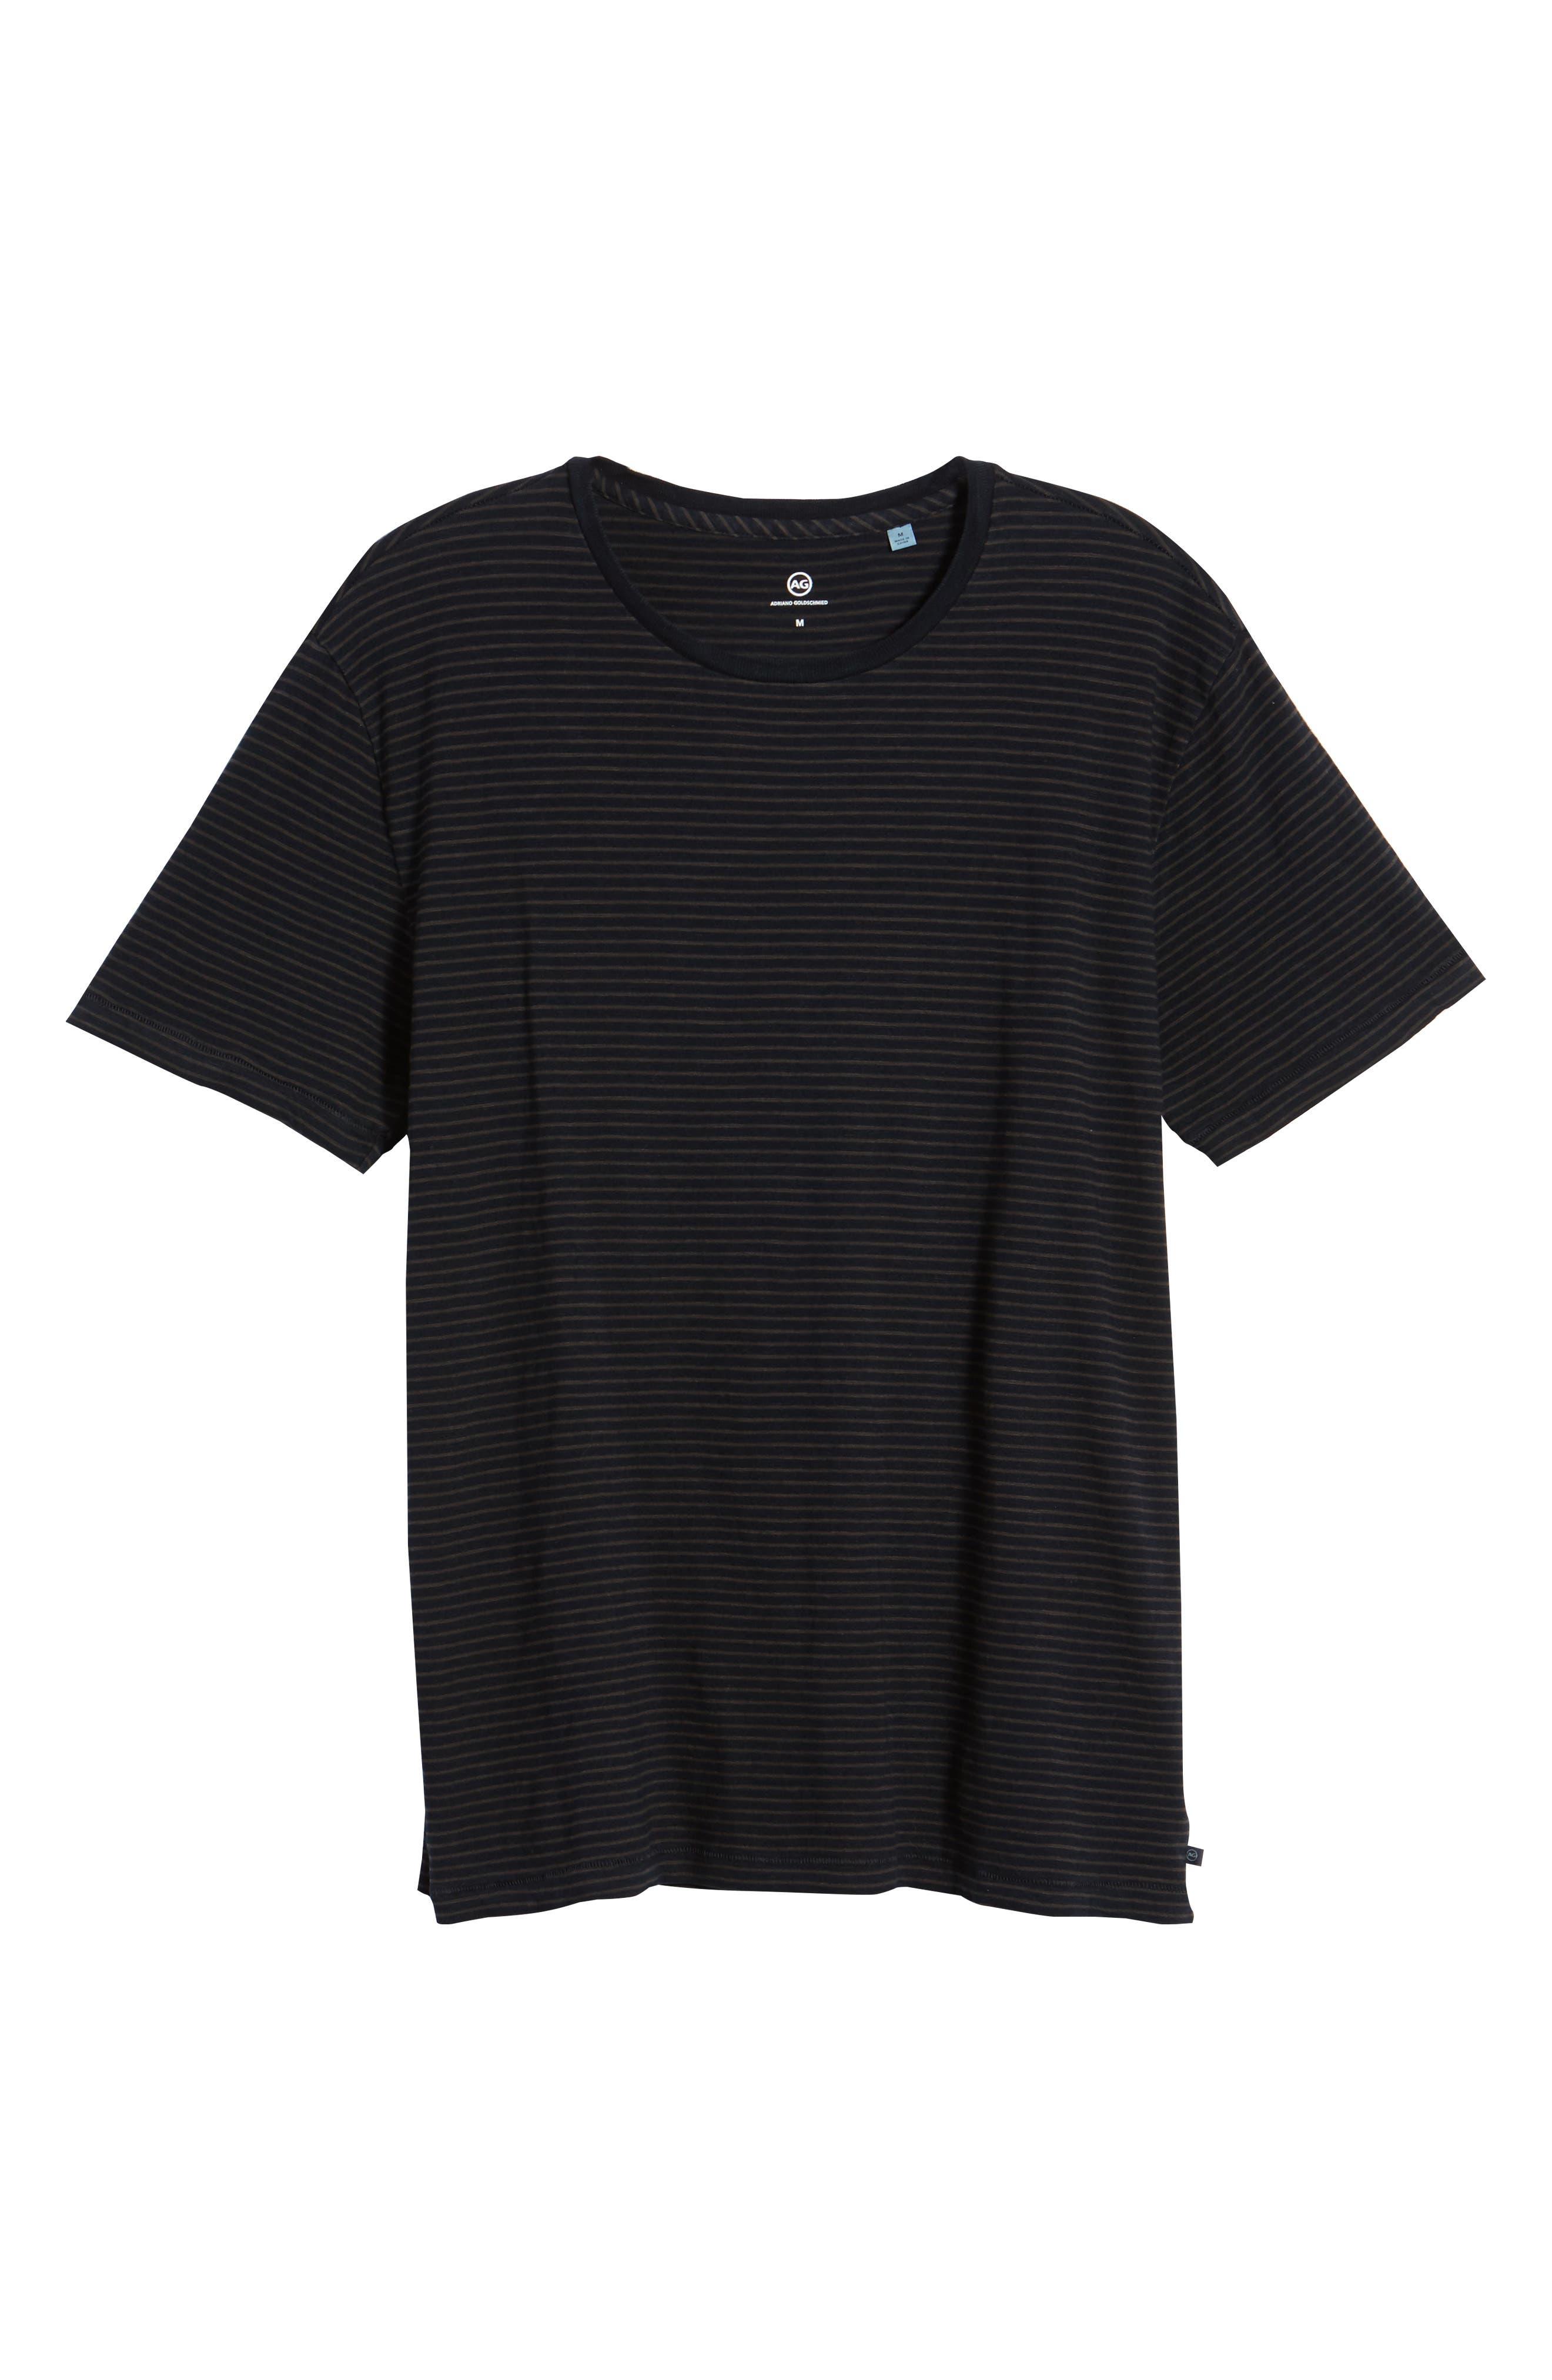 Julian Slim Fit Crewneck Shirt,                             Alternate thumbnail 16, color,